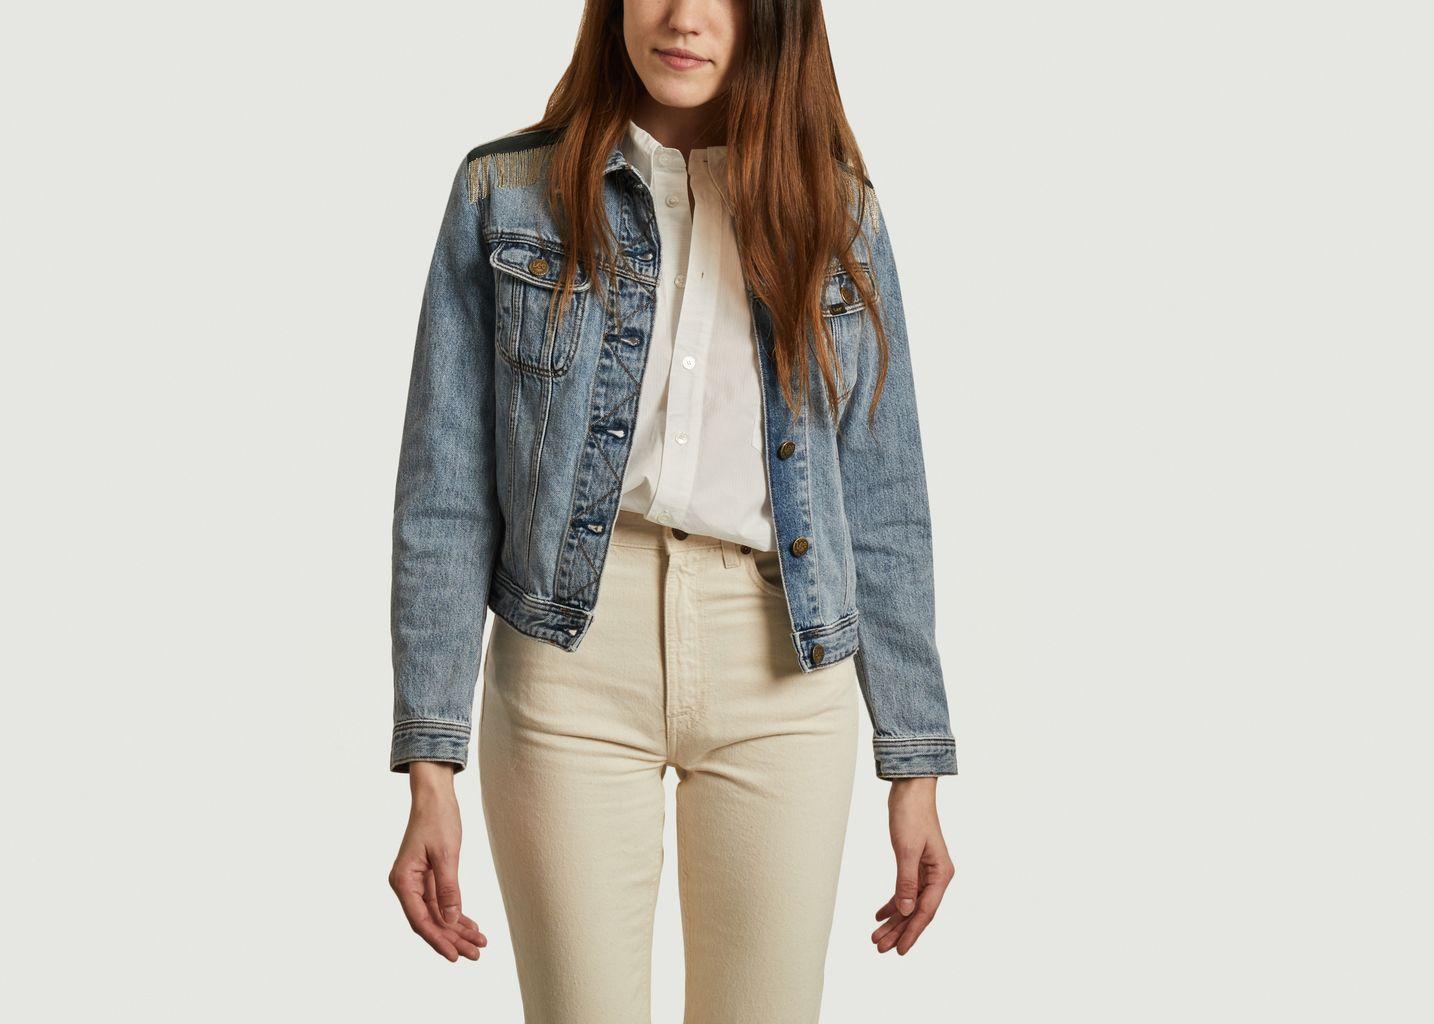 Veste en jean recyclé Romy Chains - Sarah de Saint Hubert